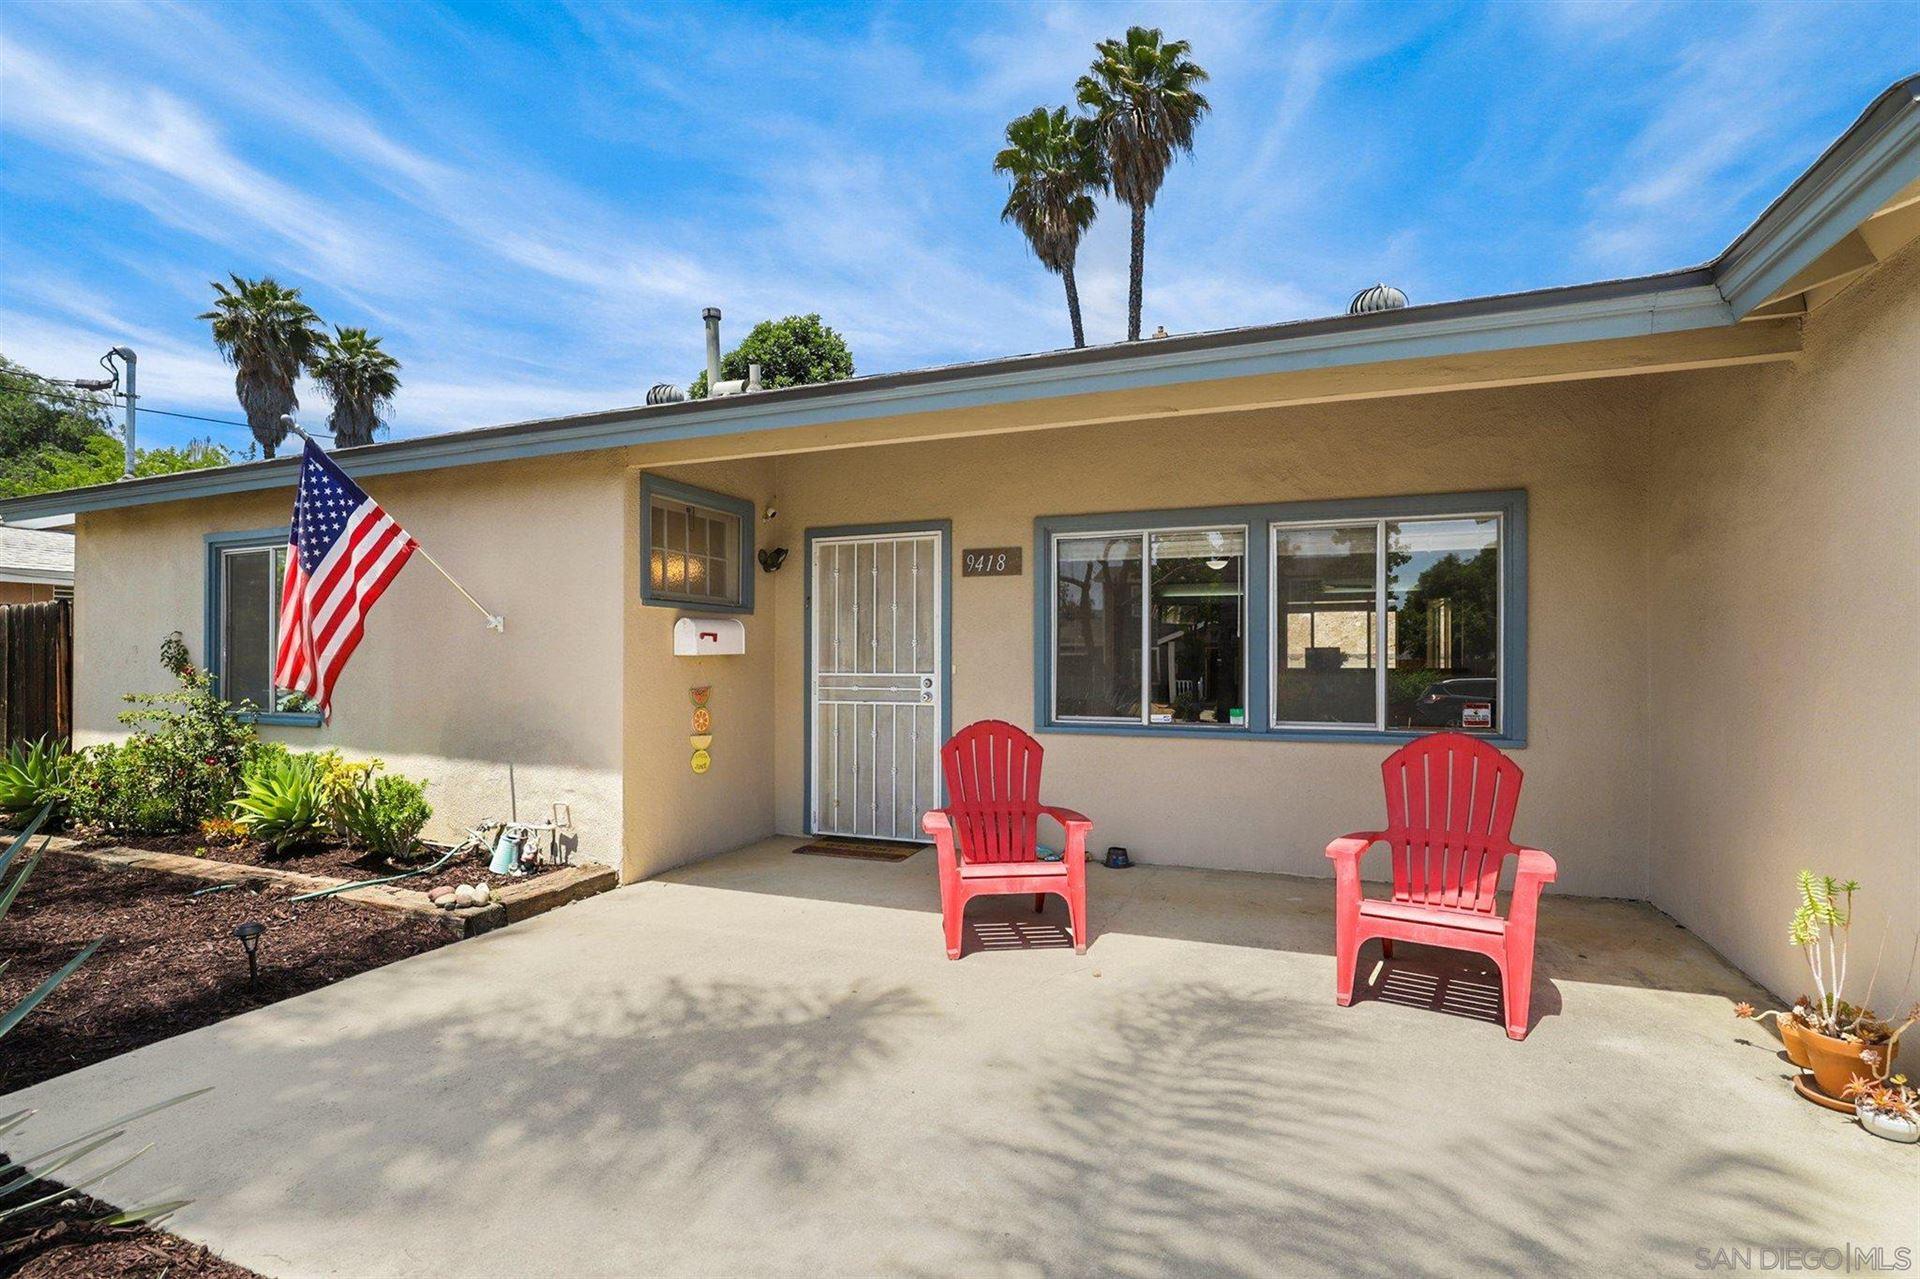 Photo of 9418 Galston Dr, Santee, CA 92071 (MLS # 210015318)